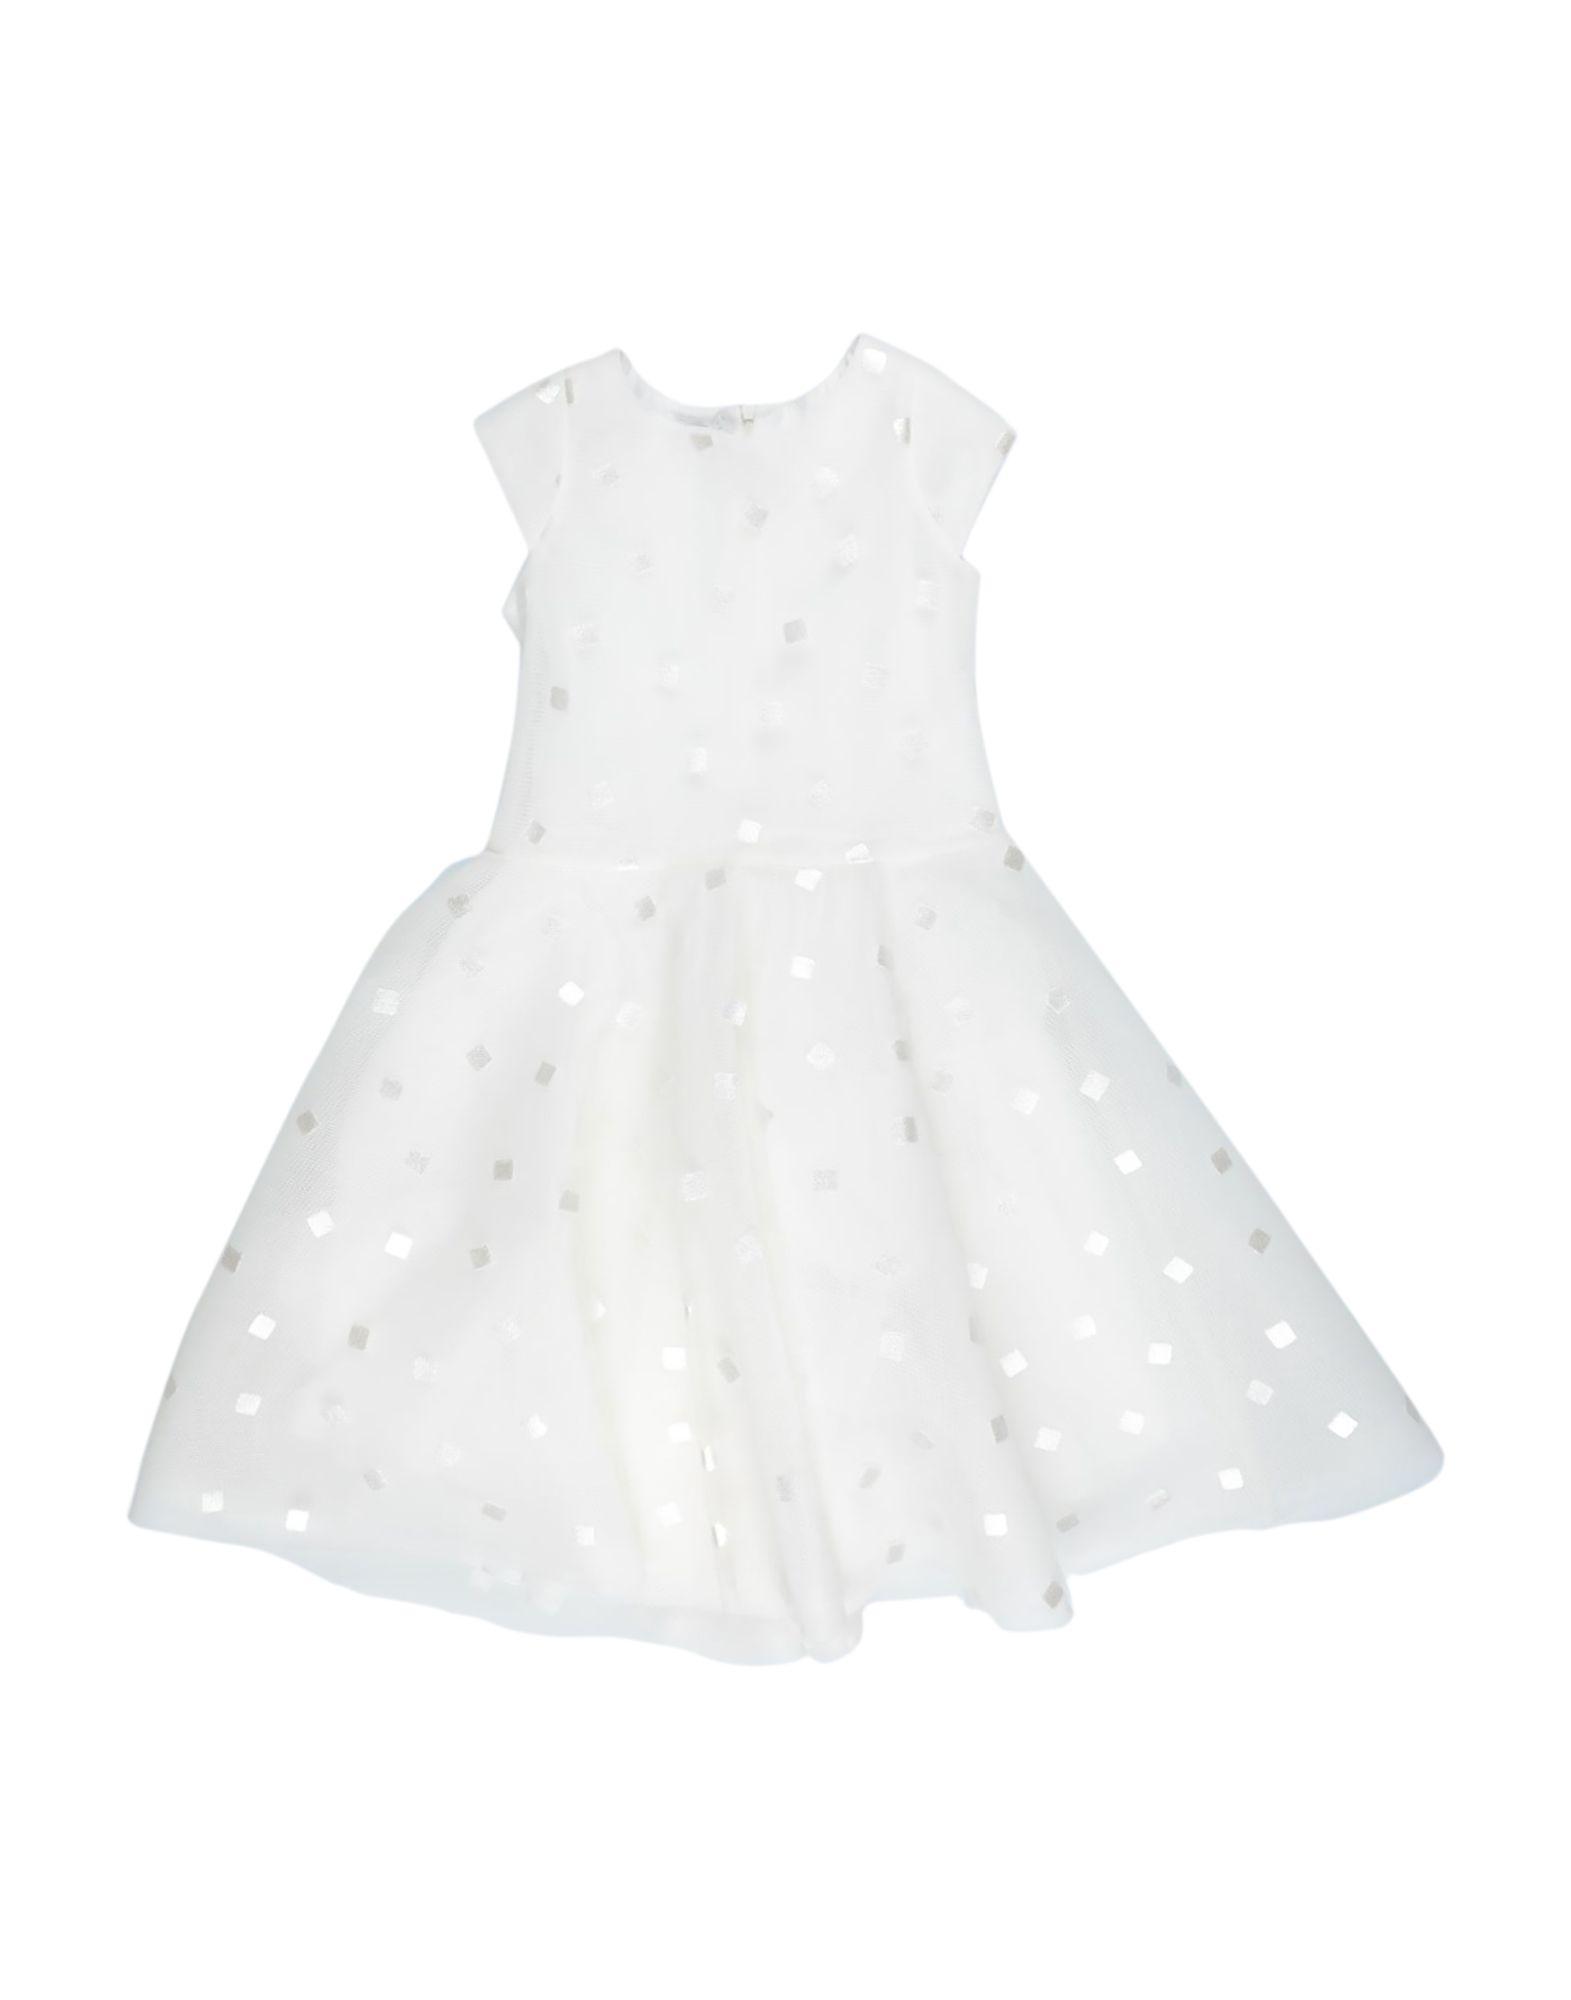 PRINCIPESSA Dresses - Item 15005240